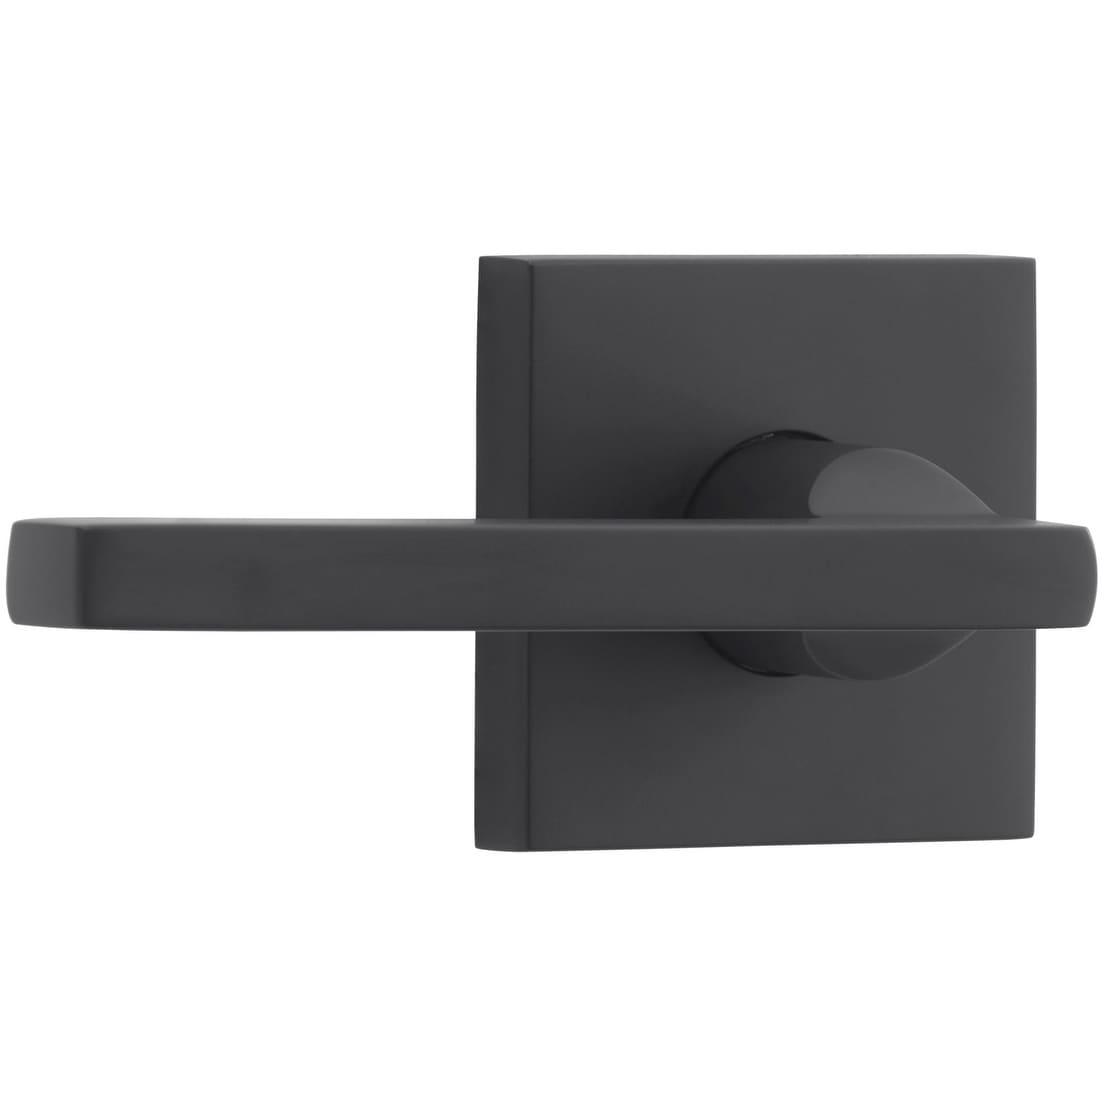 Baldwin PS SQU CSR Square Passage Door Lever Set with Contemporary Square  Rose - Satin Black